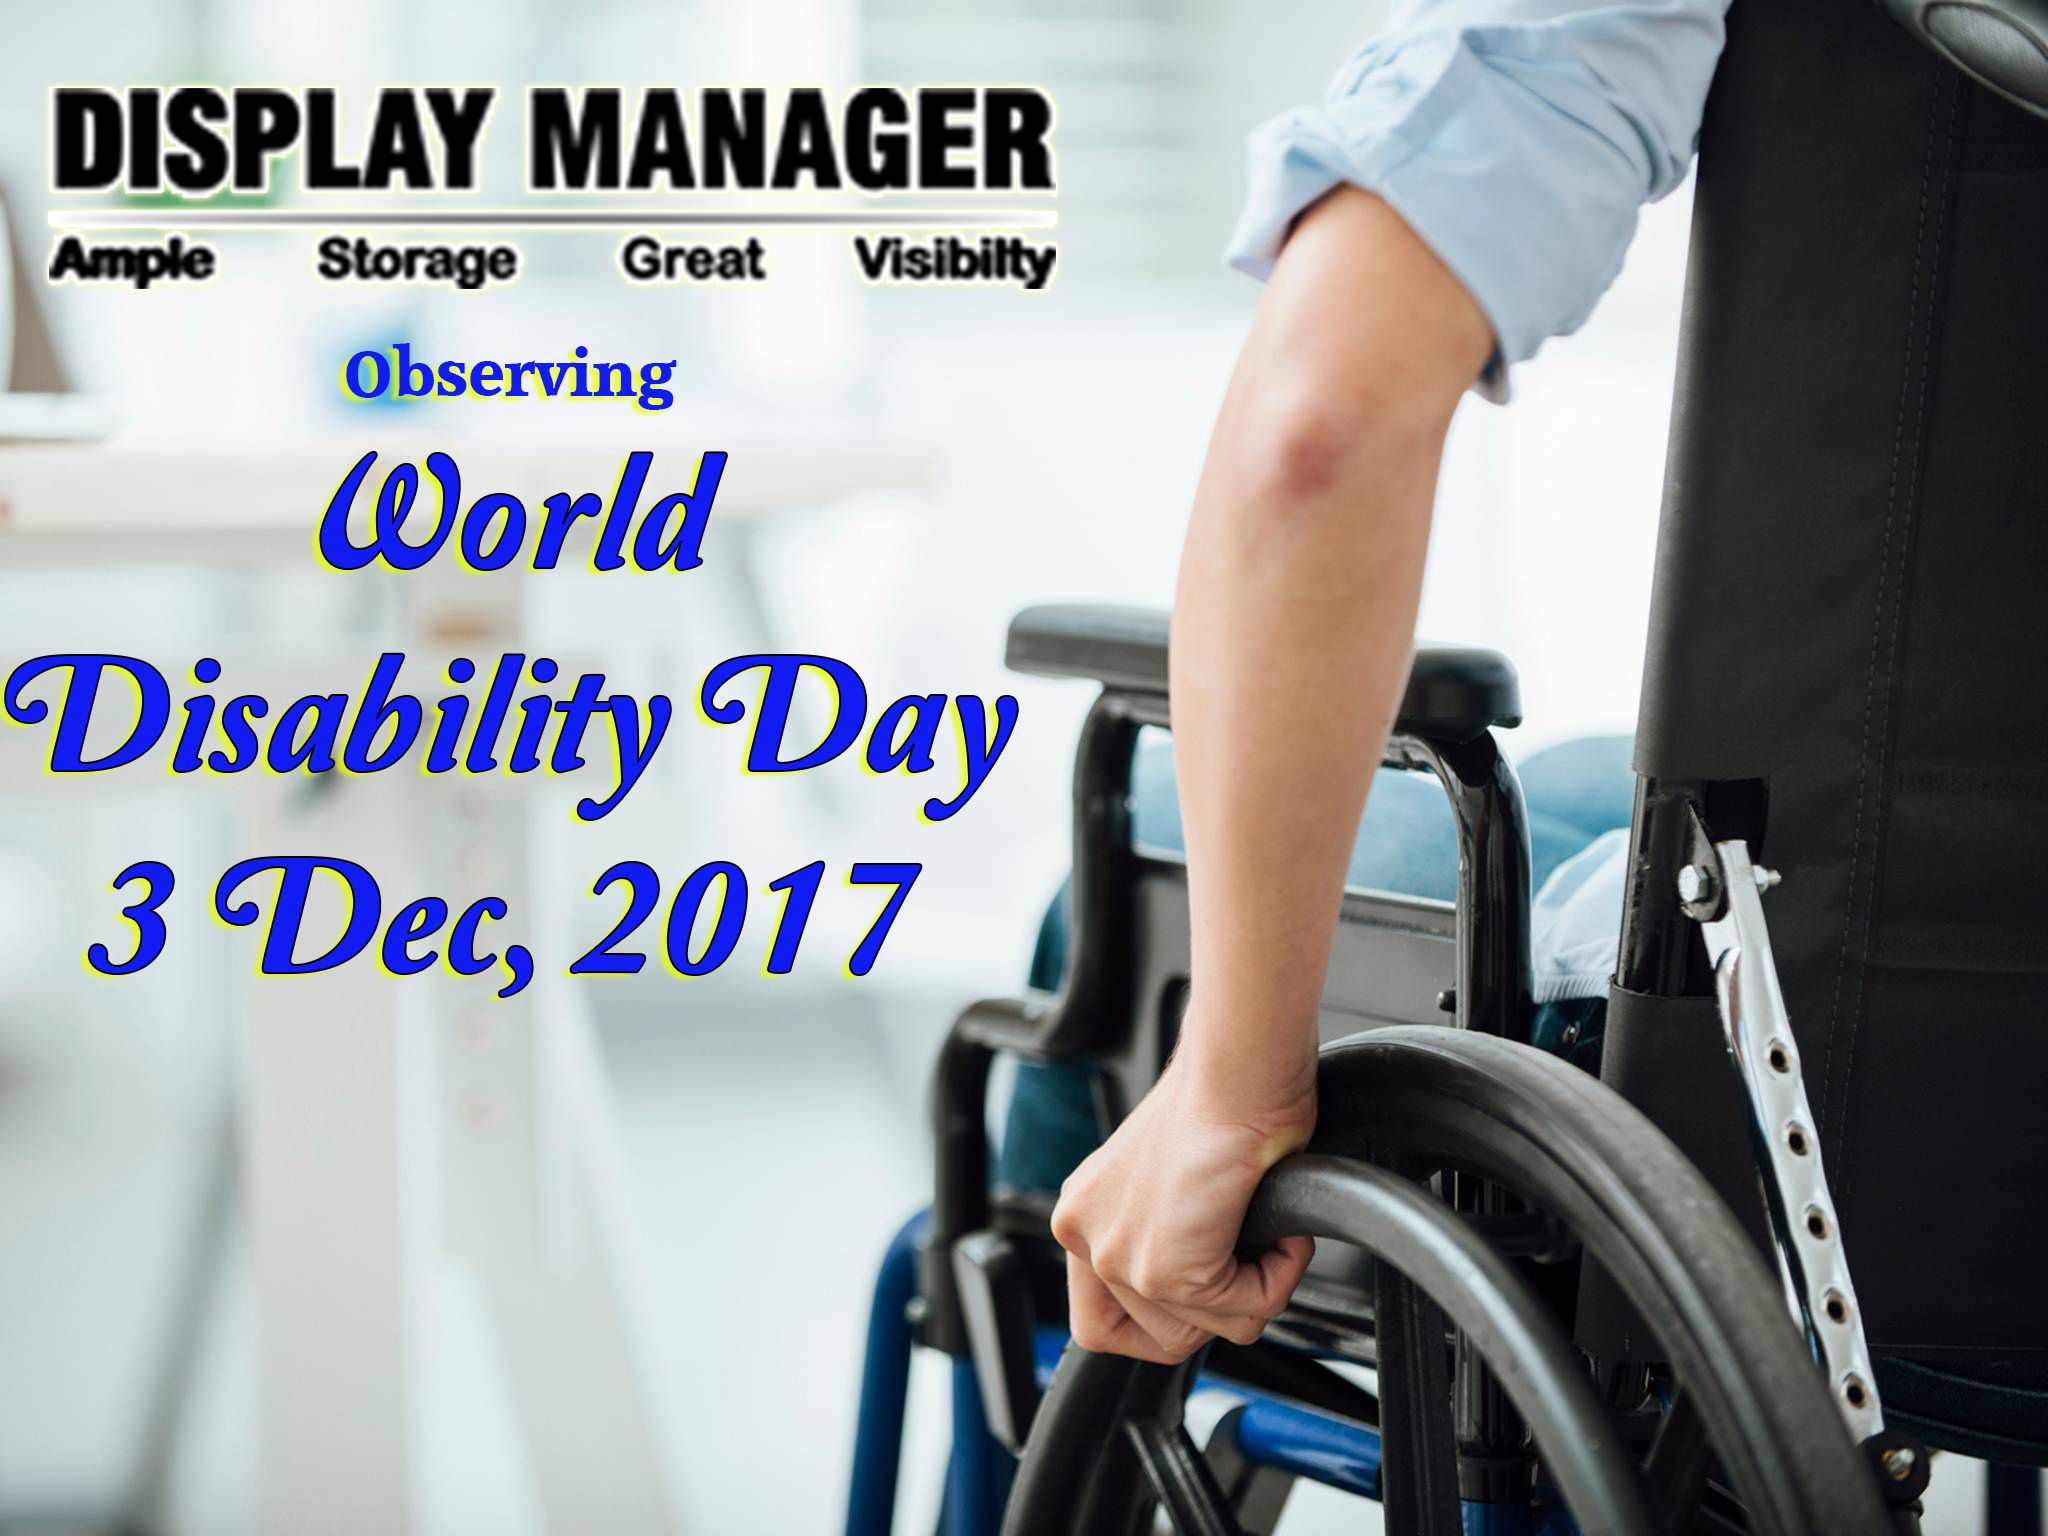 Displaymanager observing world disabilityday 3rd dec